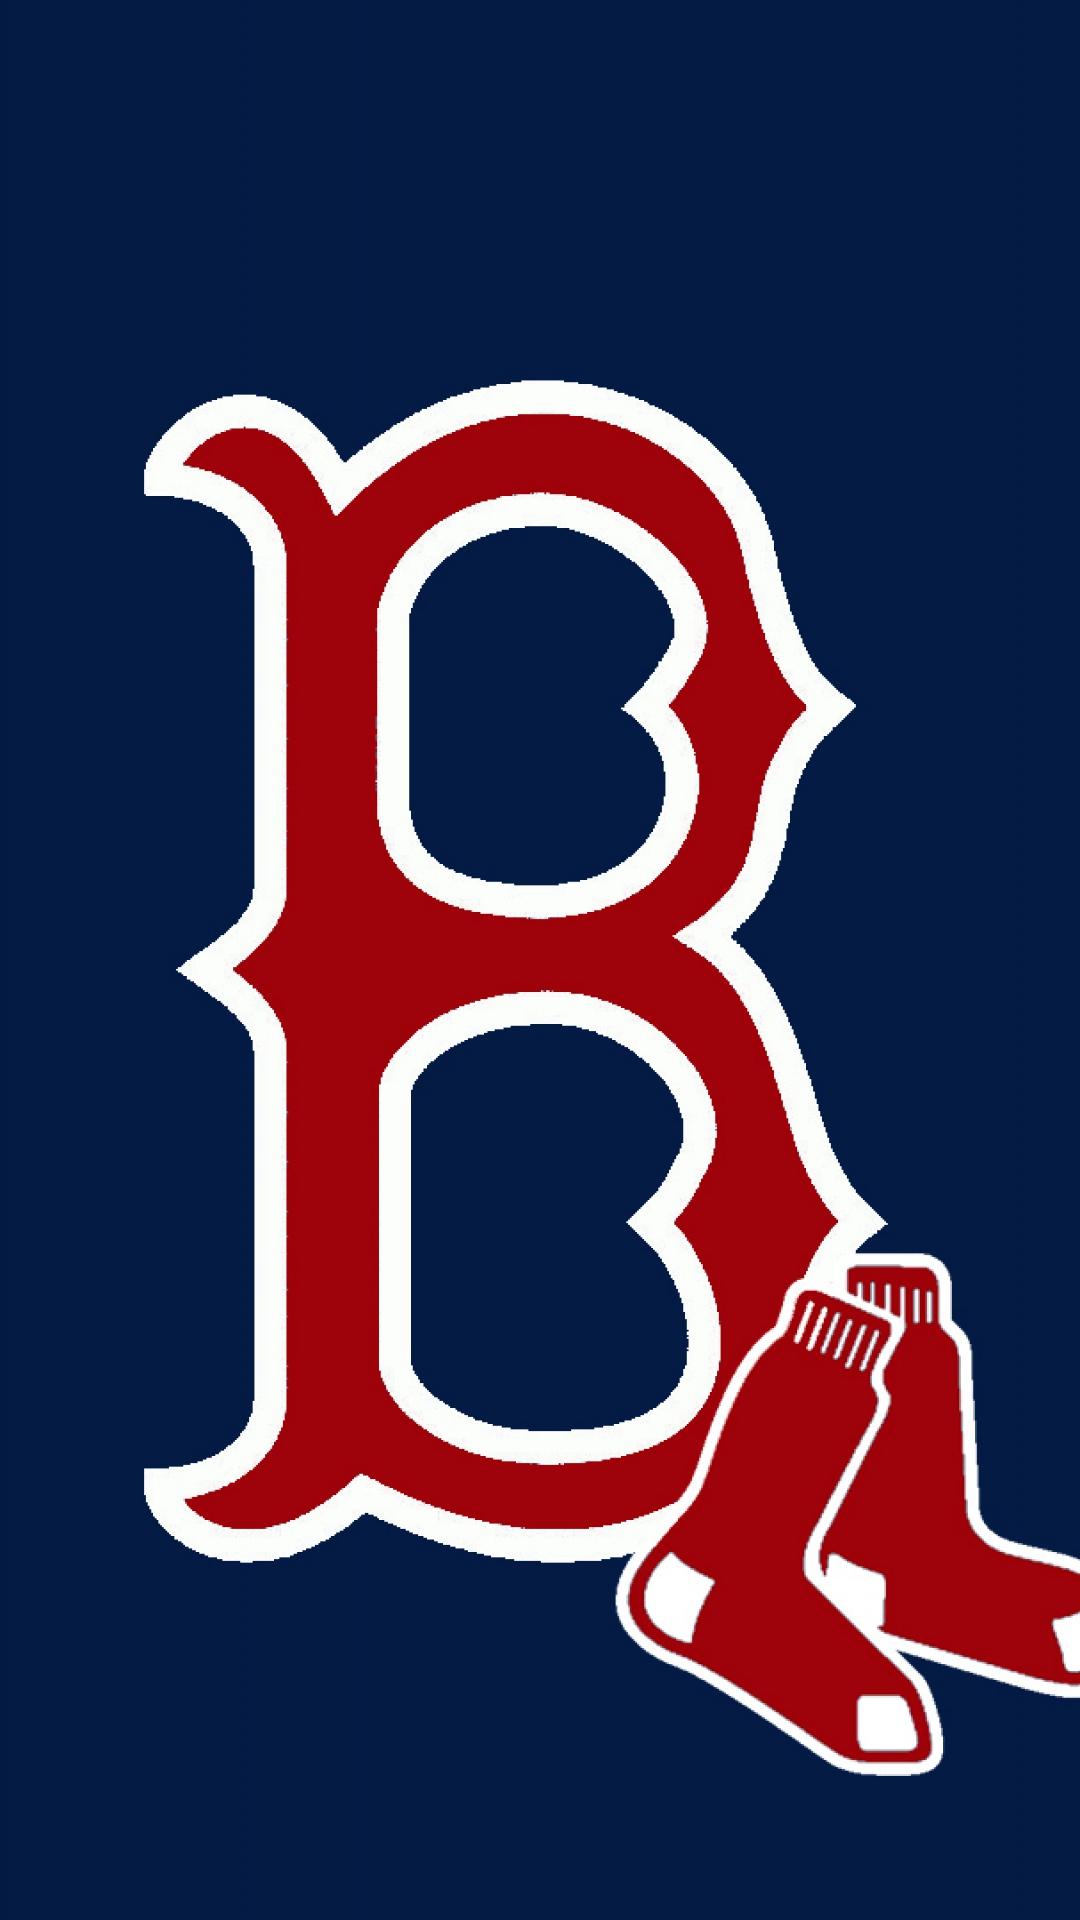 Boston Red Sox iPhone Wallpaper HD 1080x1920